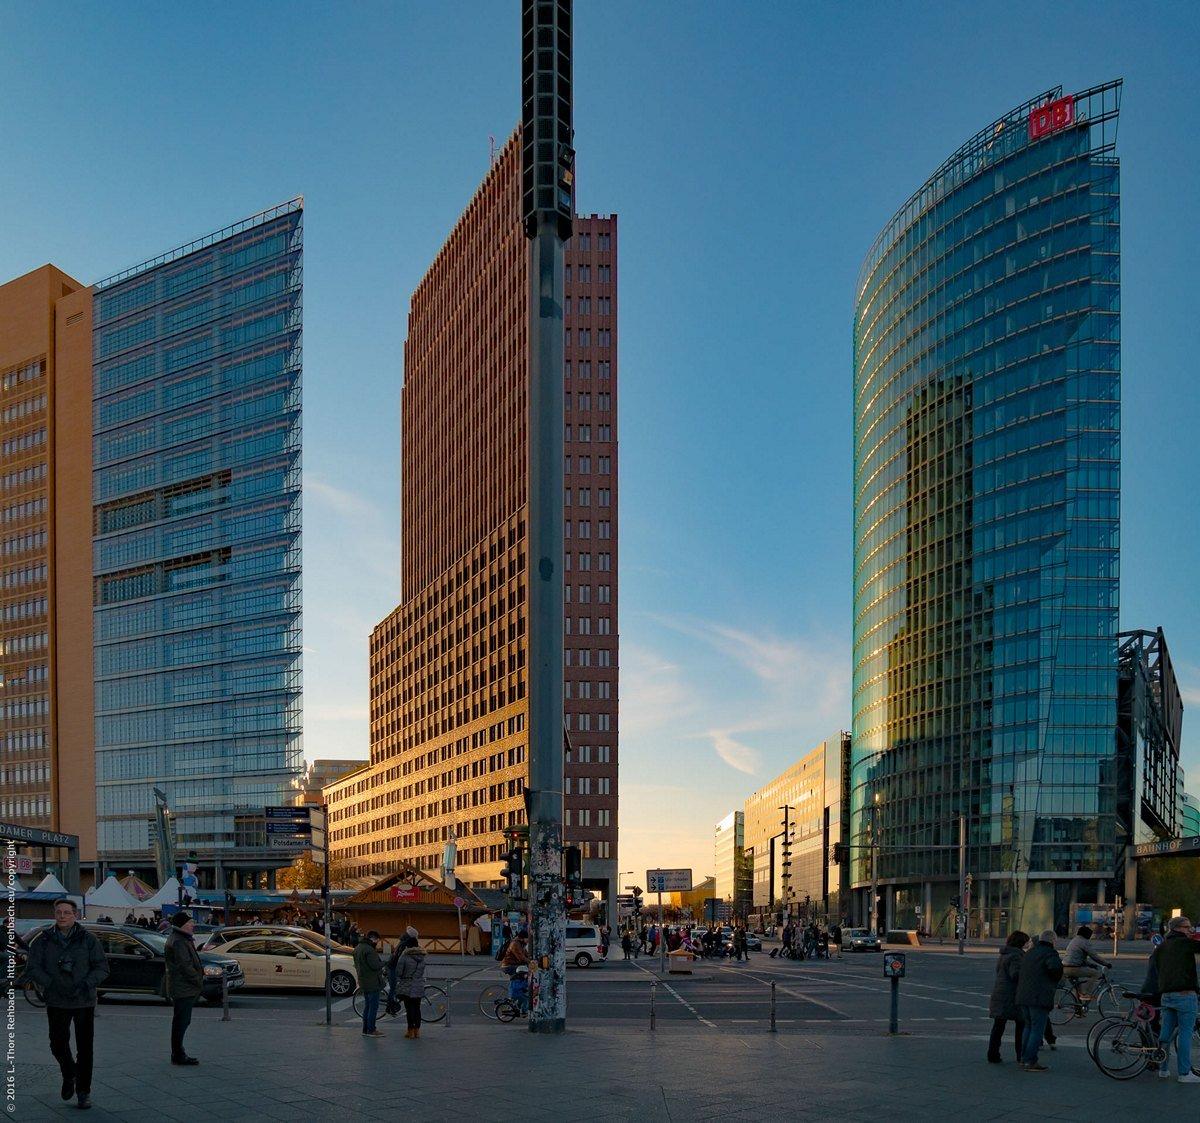 Spätherbst am Potsdamer Platz